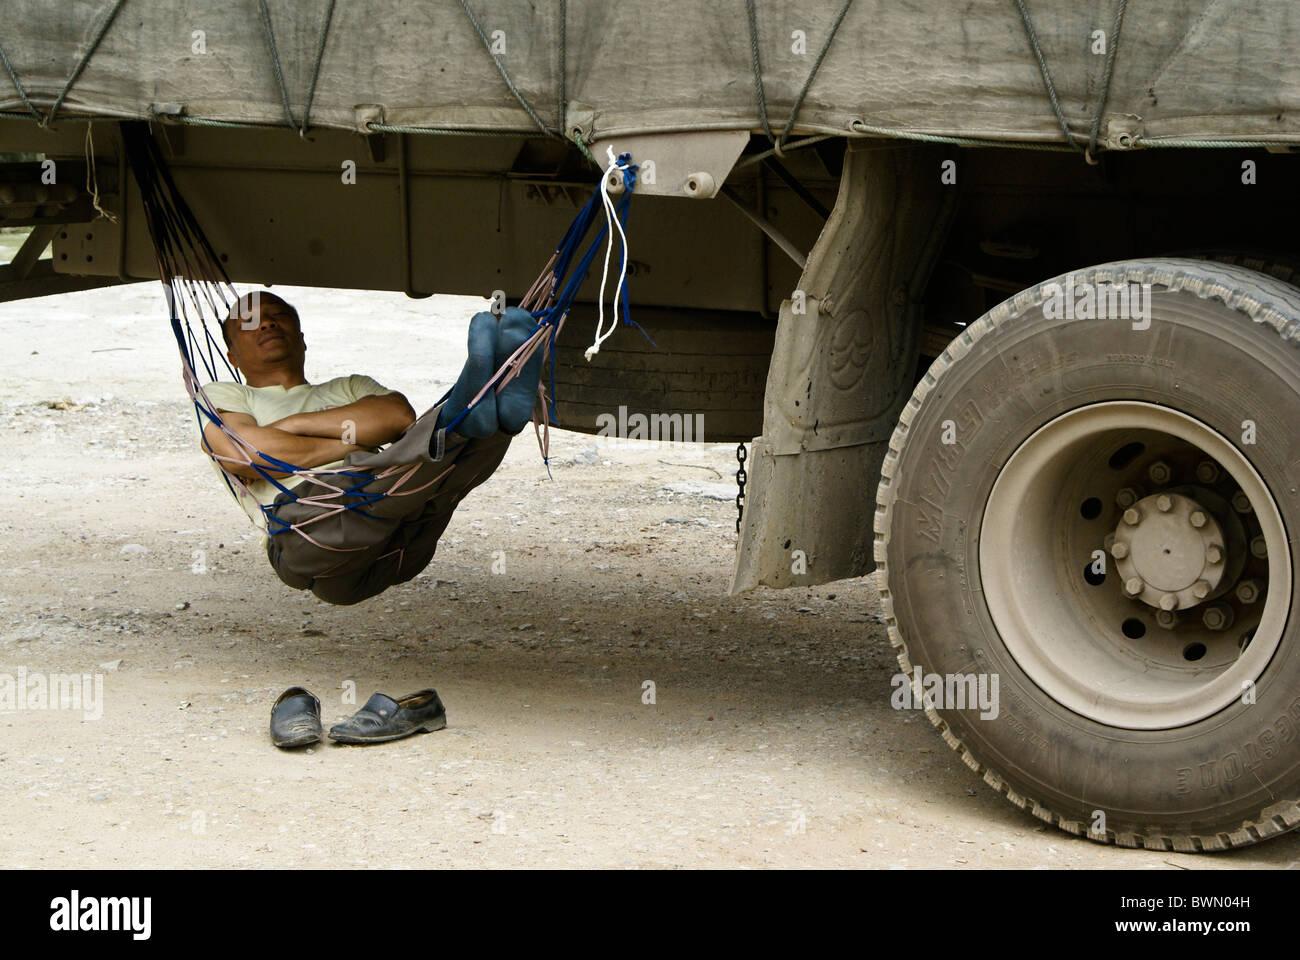 Man sleeping in hammock under his truck, Fuli, Guangxi, China - Stock Image